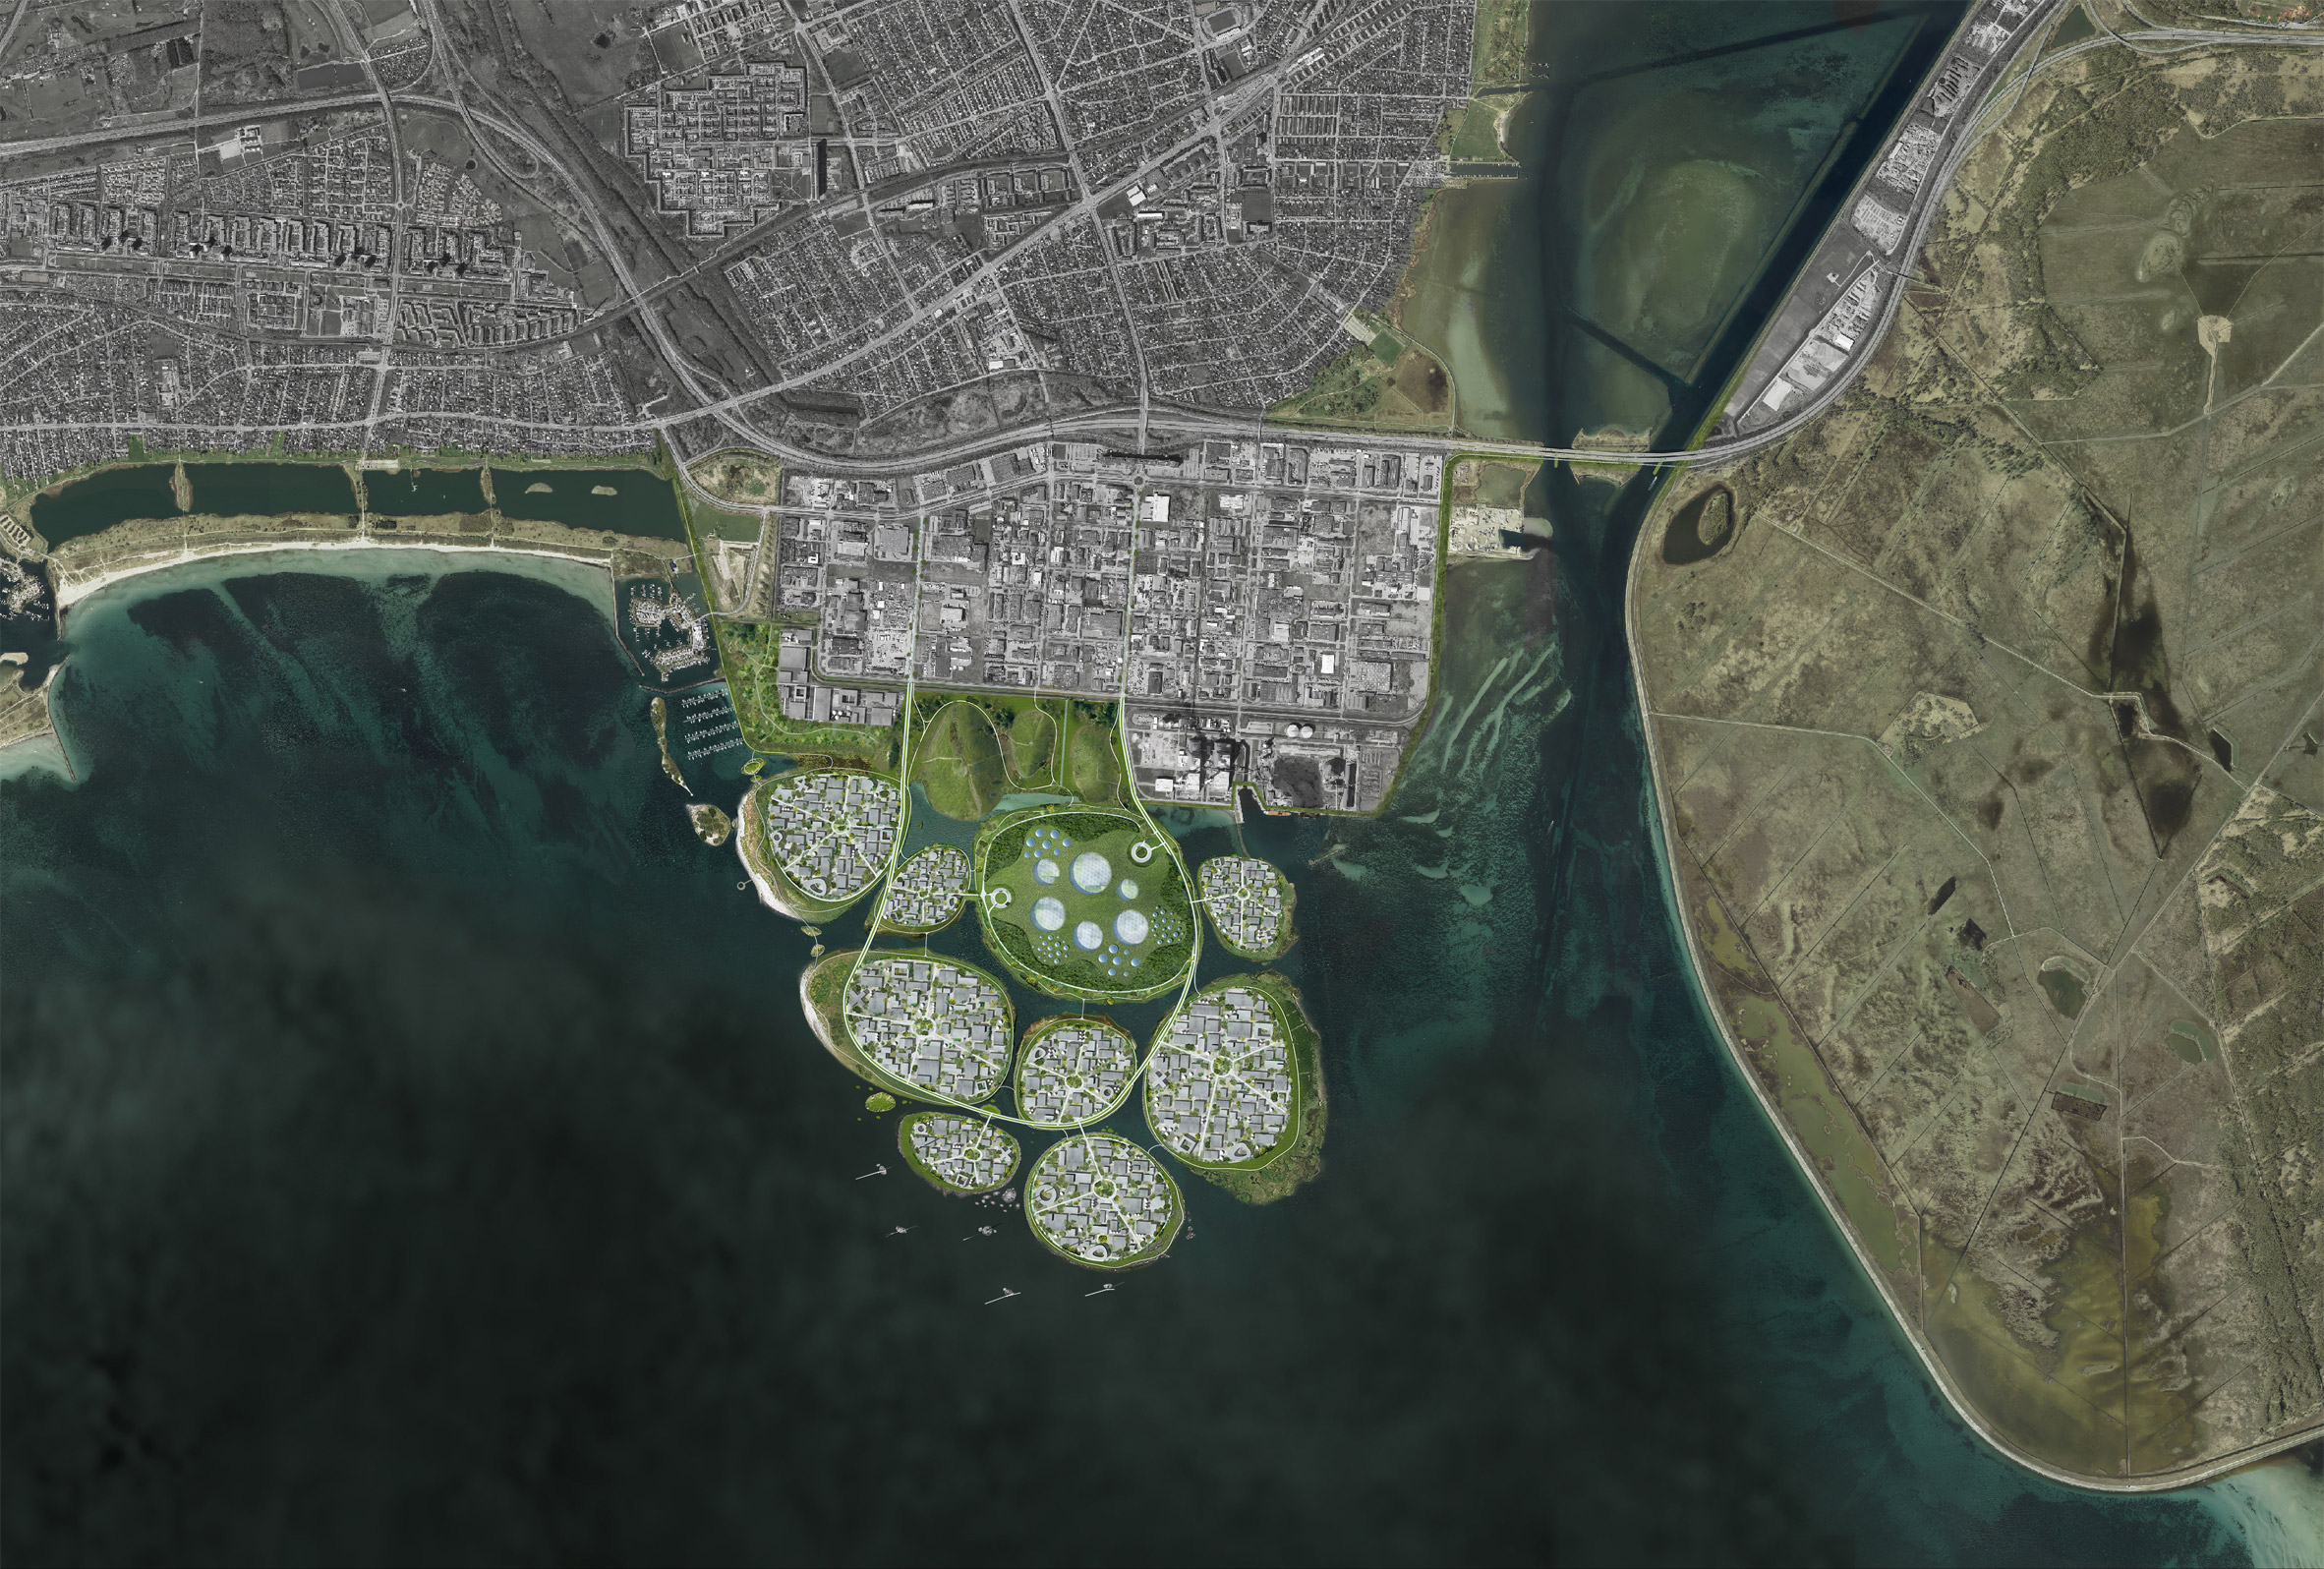 Holmene by Urban Power in Denmark